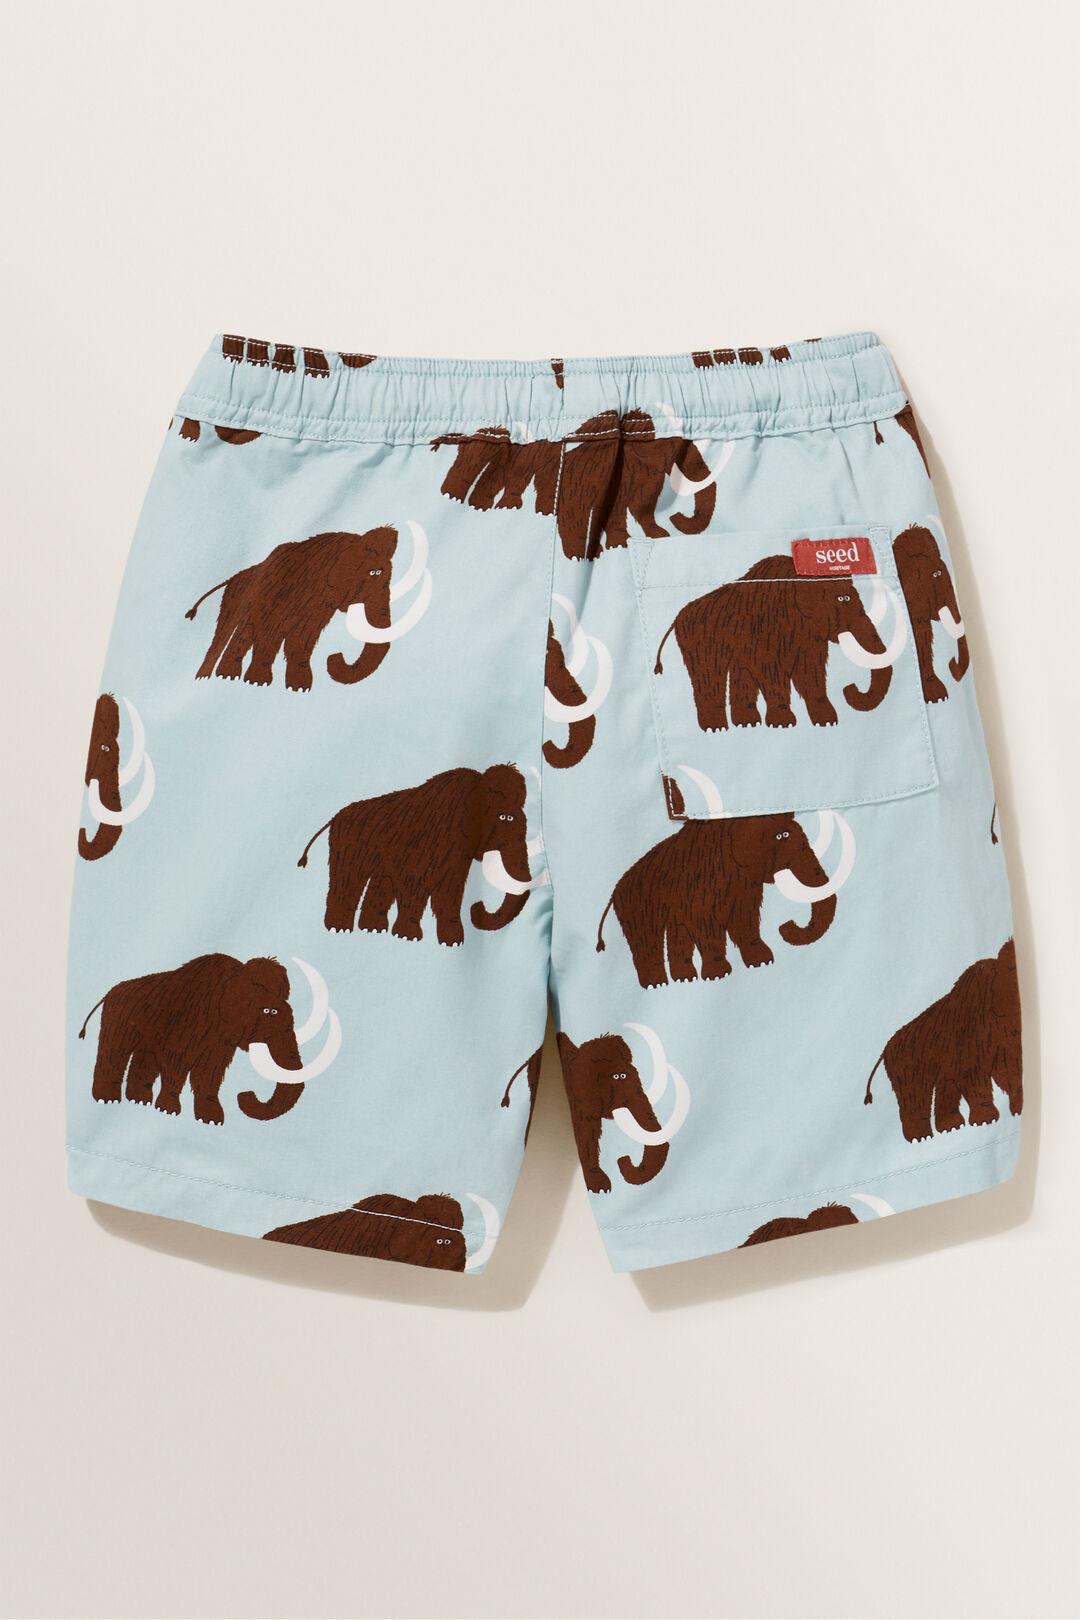 Woolly Mammoth Shorts  SEA FOAM  hi-res